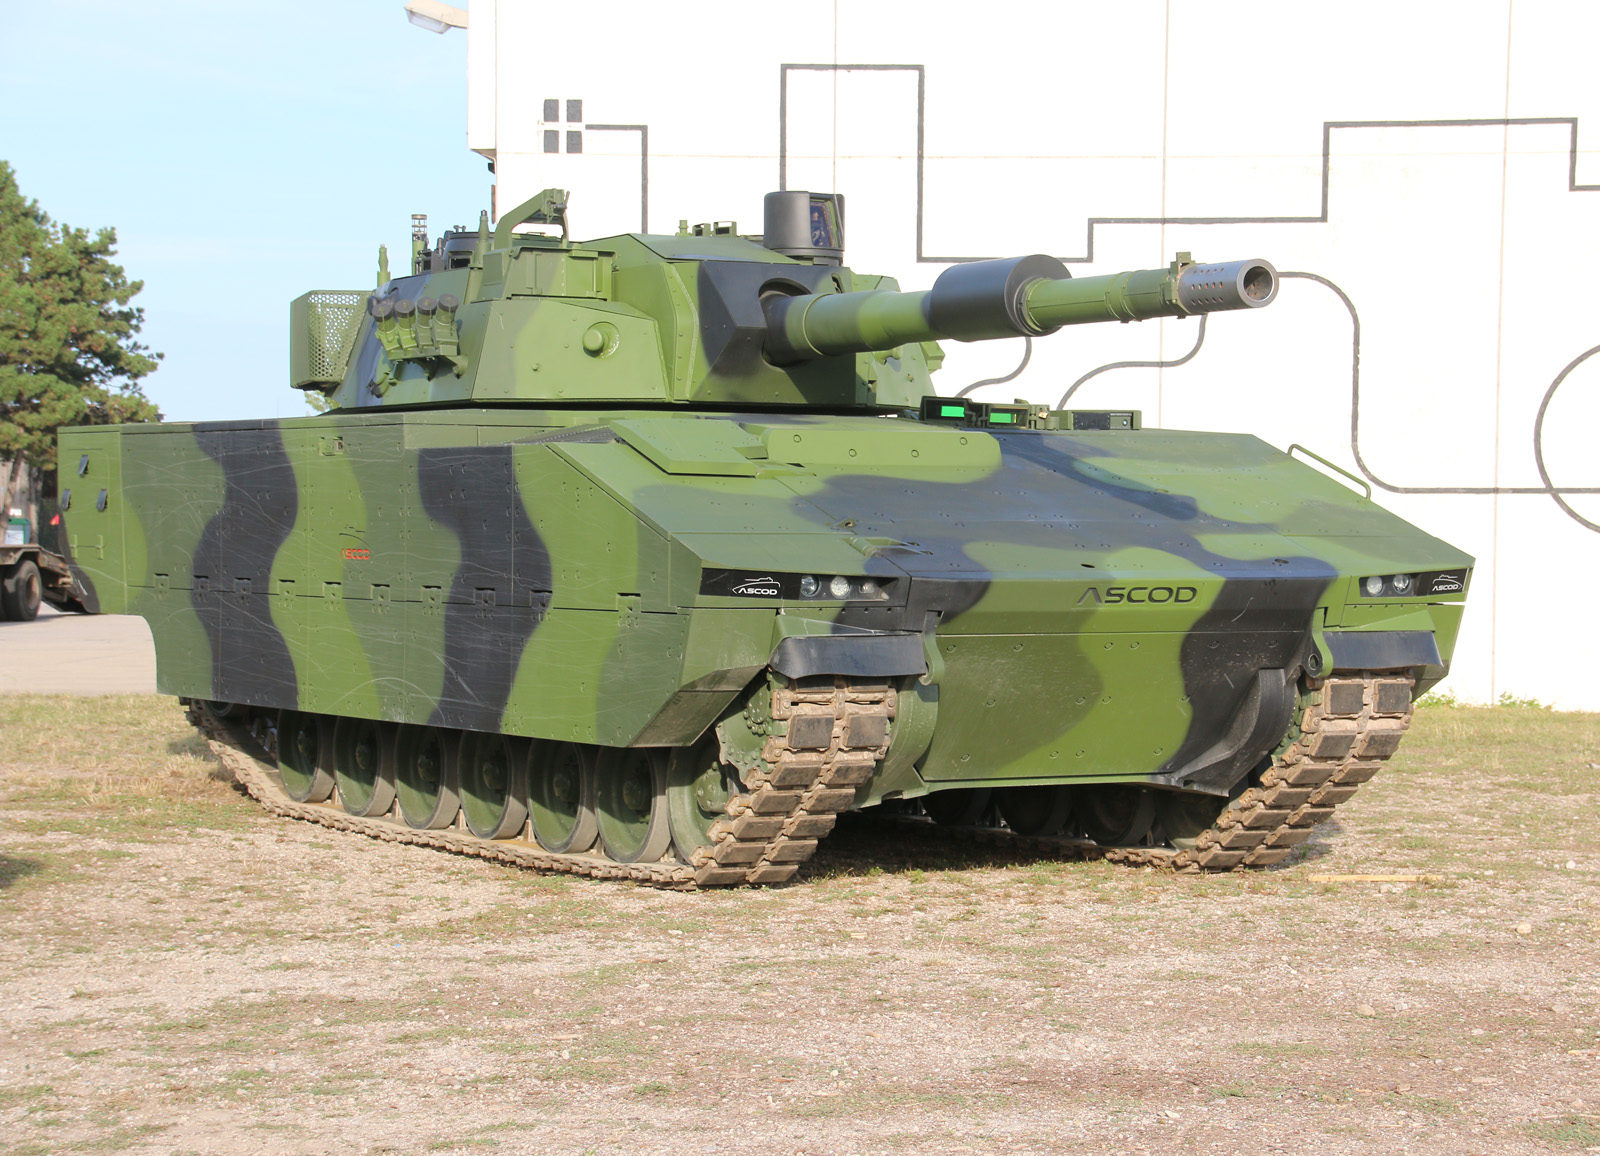 Prototyp des ASCOD Medium Main Battle Tank (Werk) © Doppeladler.com